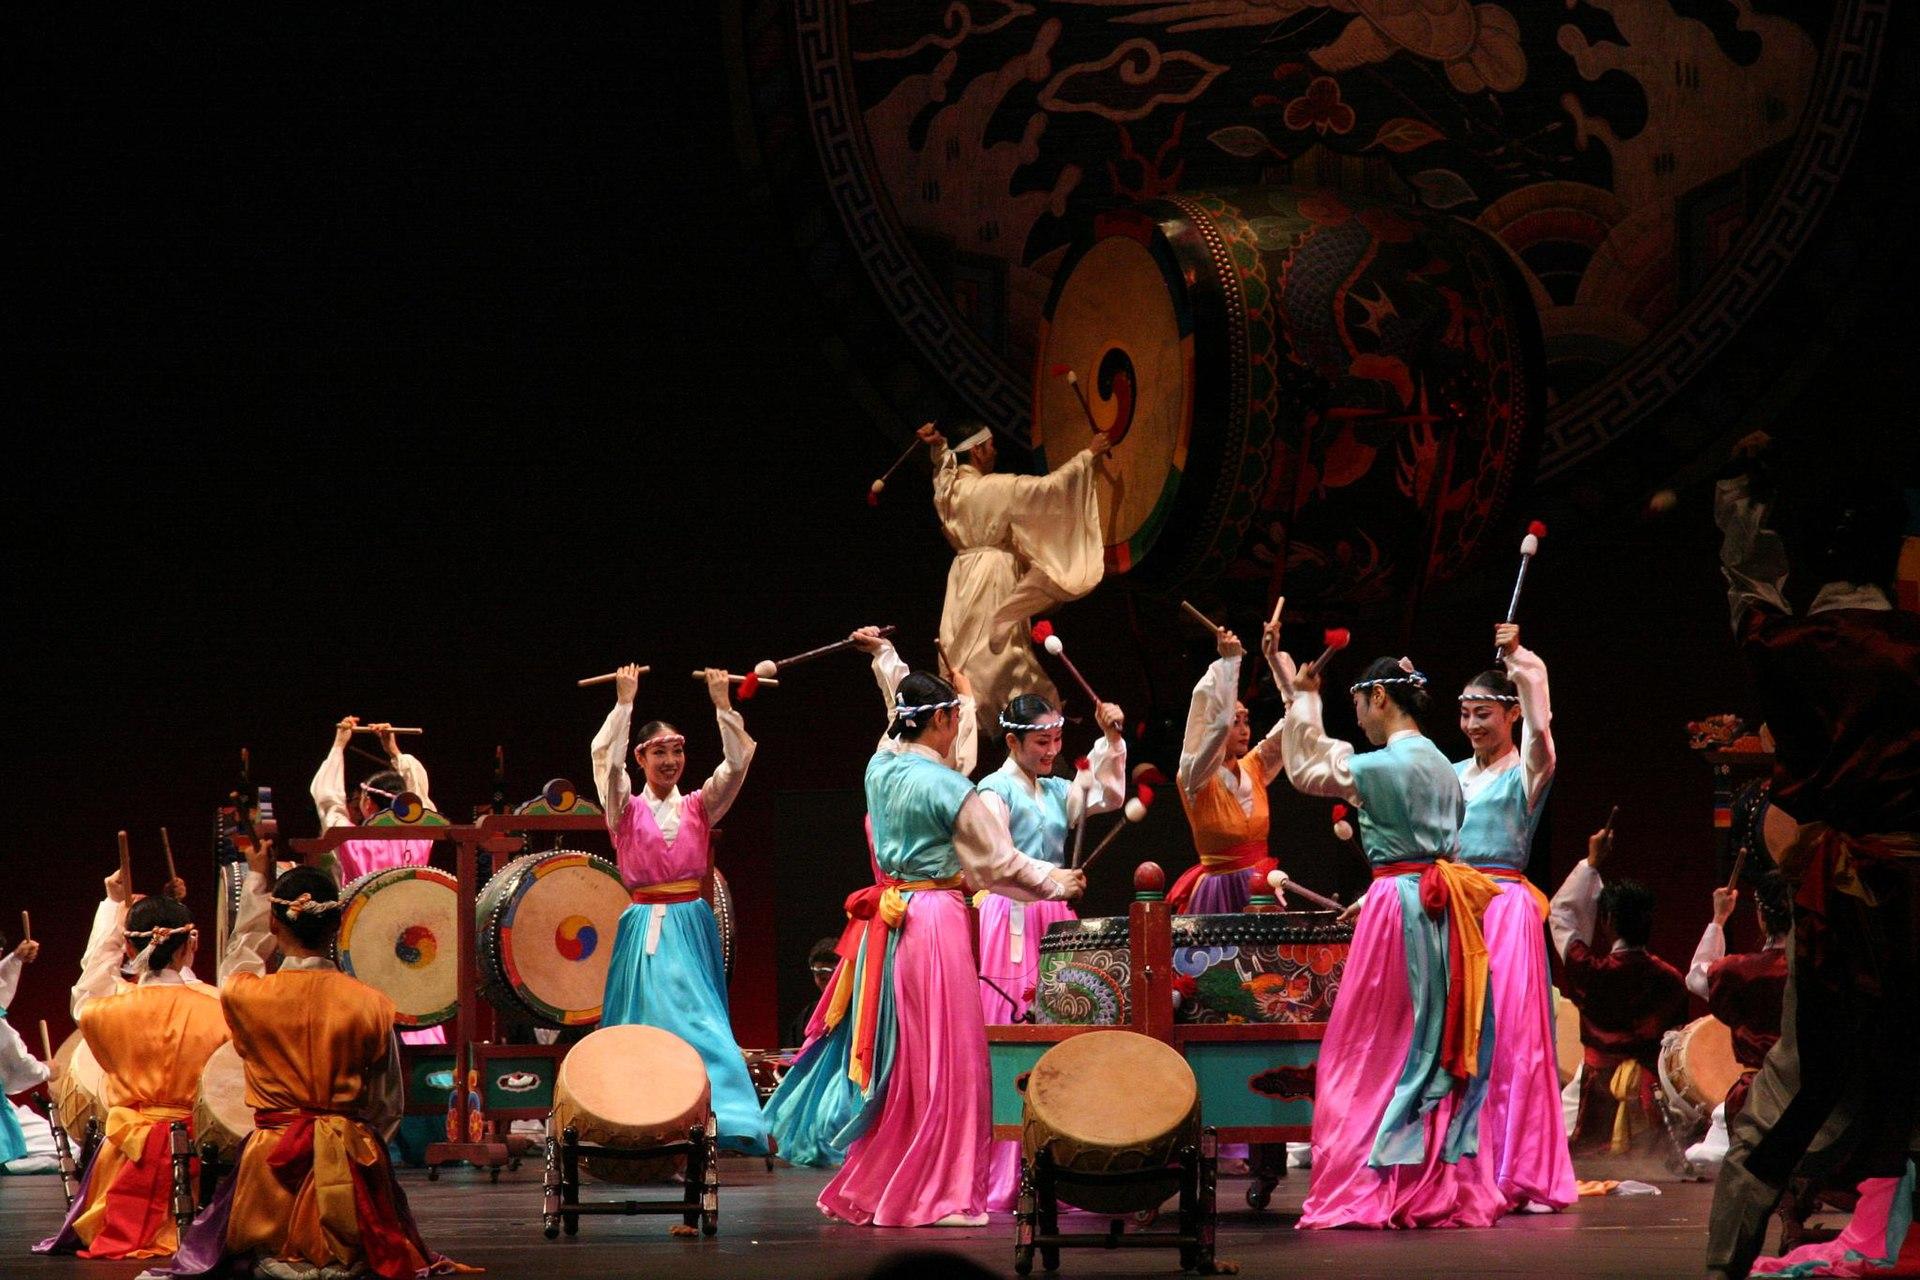 chair dance ritual song medical shower korean wikipedia